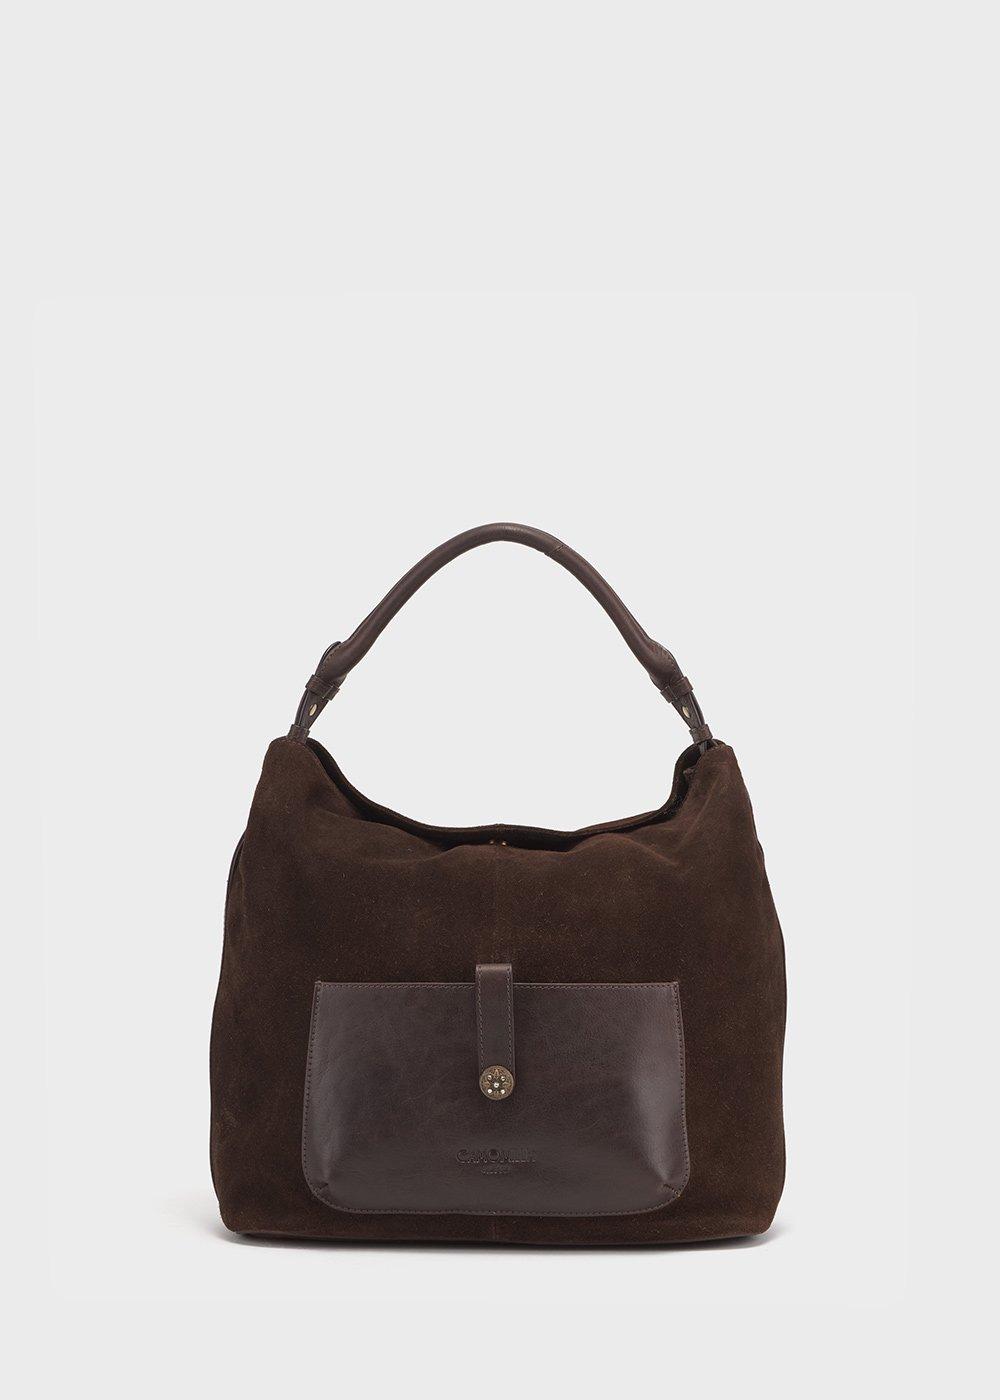 Brad brown leather bag - Brown - Woman